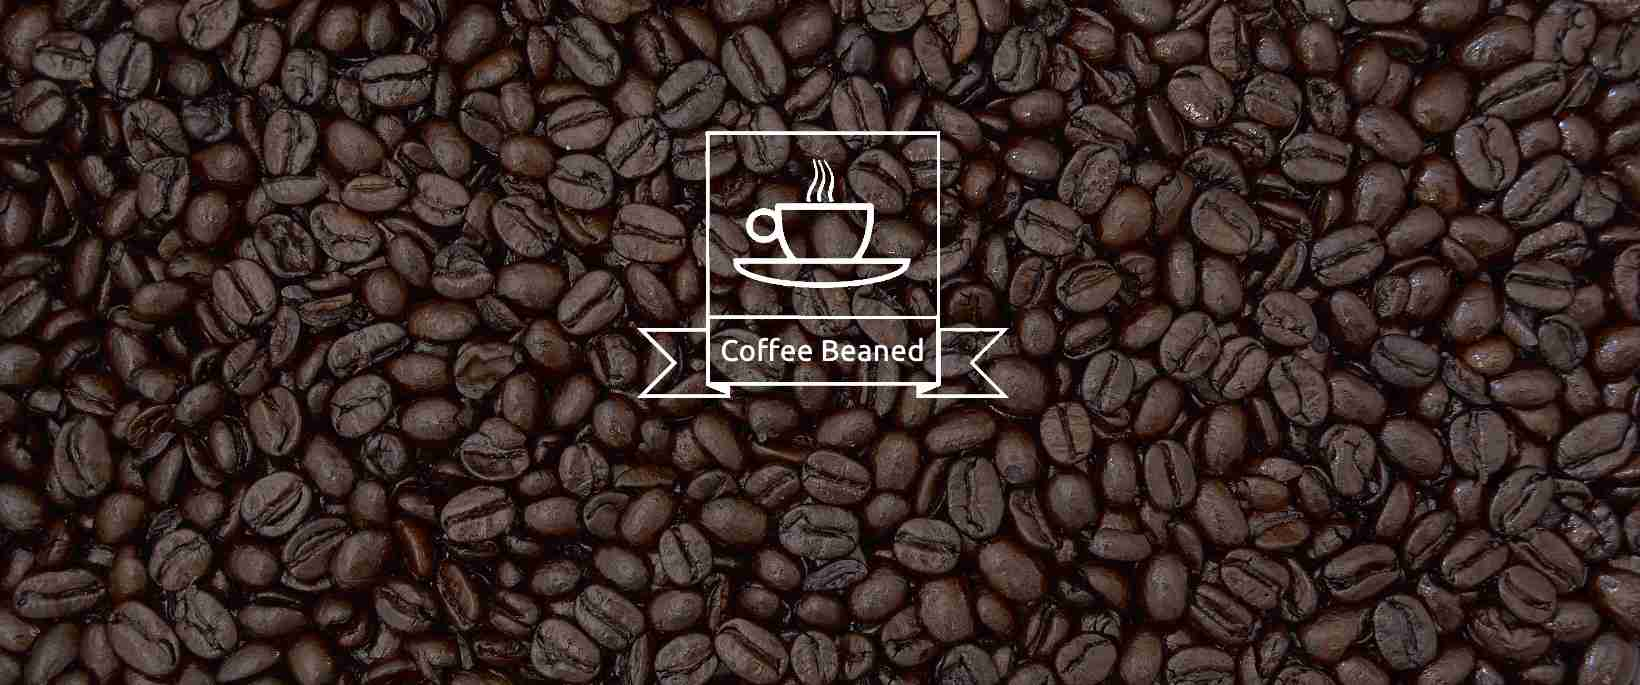 CoffeeBeaned.com logo image